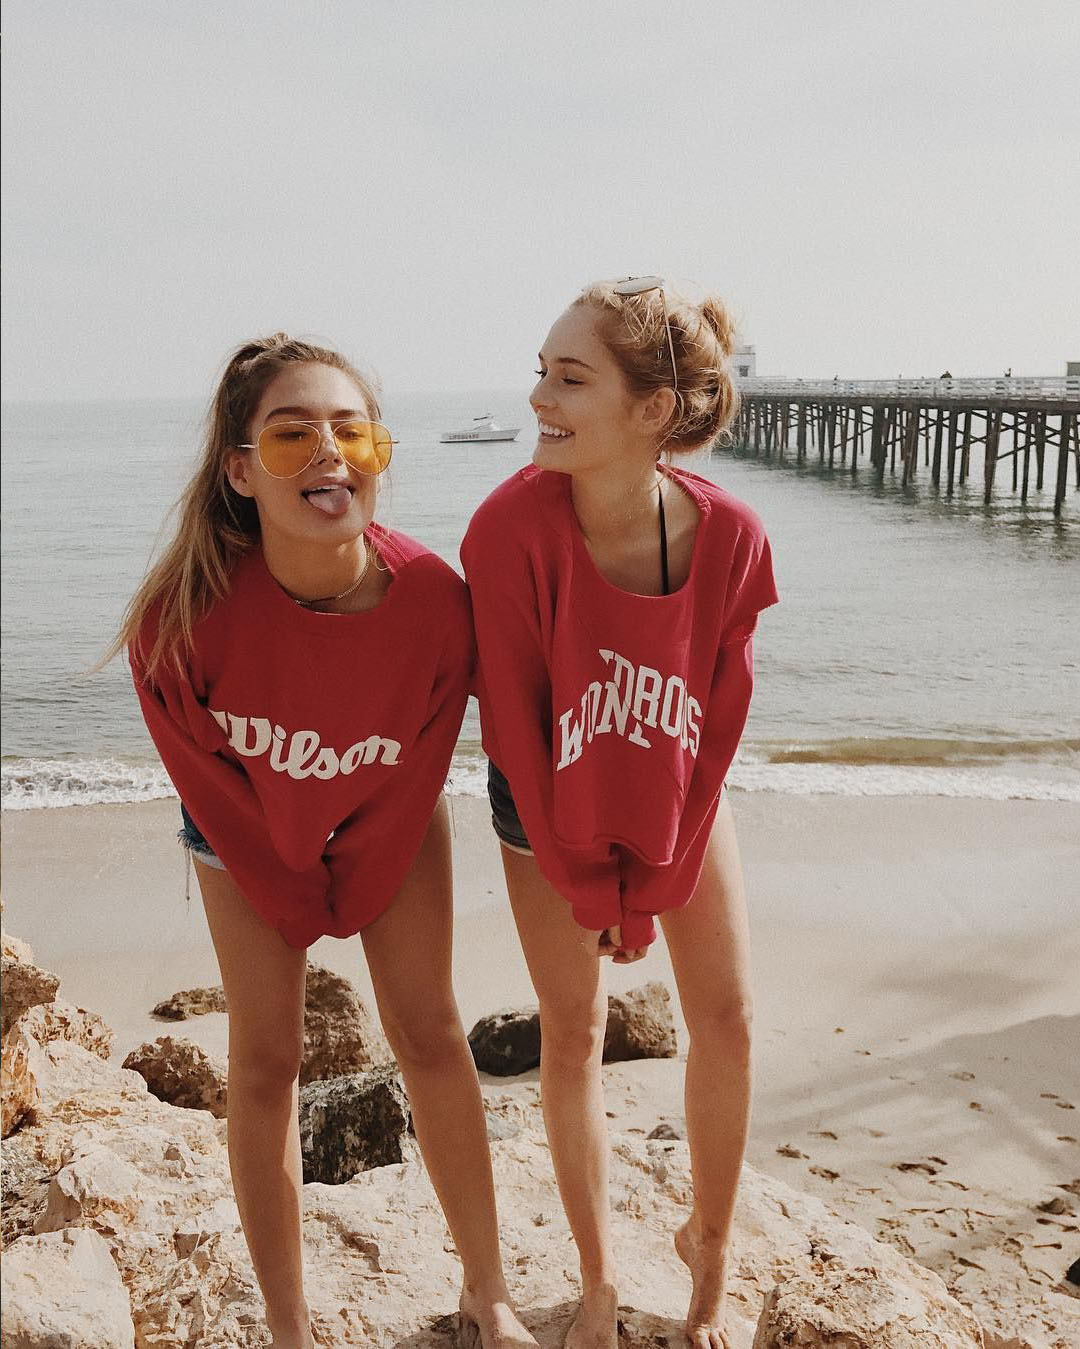 91 Best At The Beach Images On Pinterest: Poses Para Fotos Tumblr De AMIGAS Para Imitar Fáciles